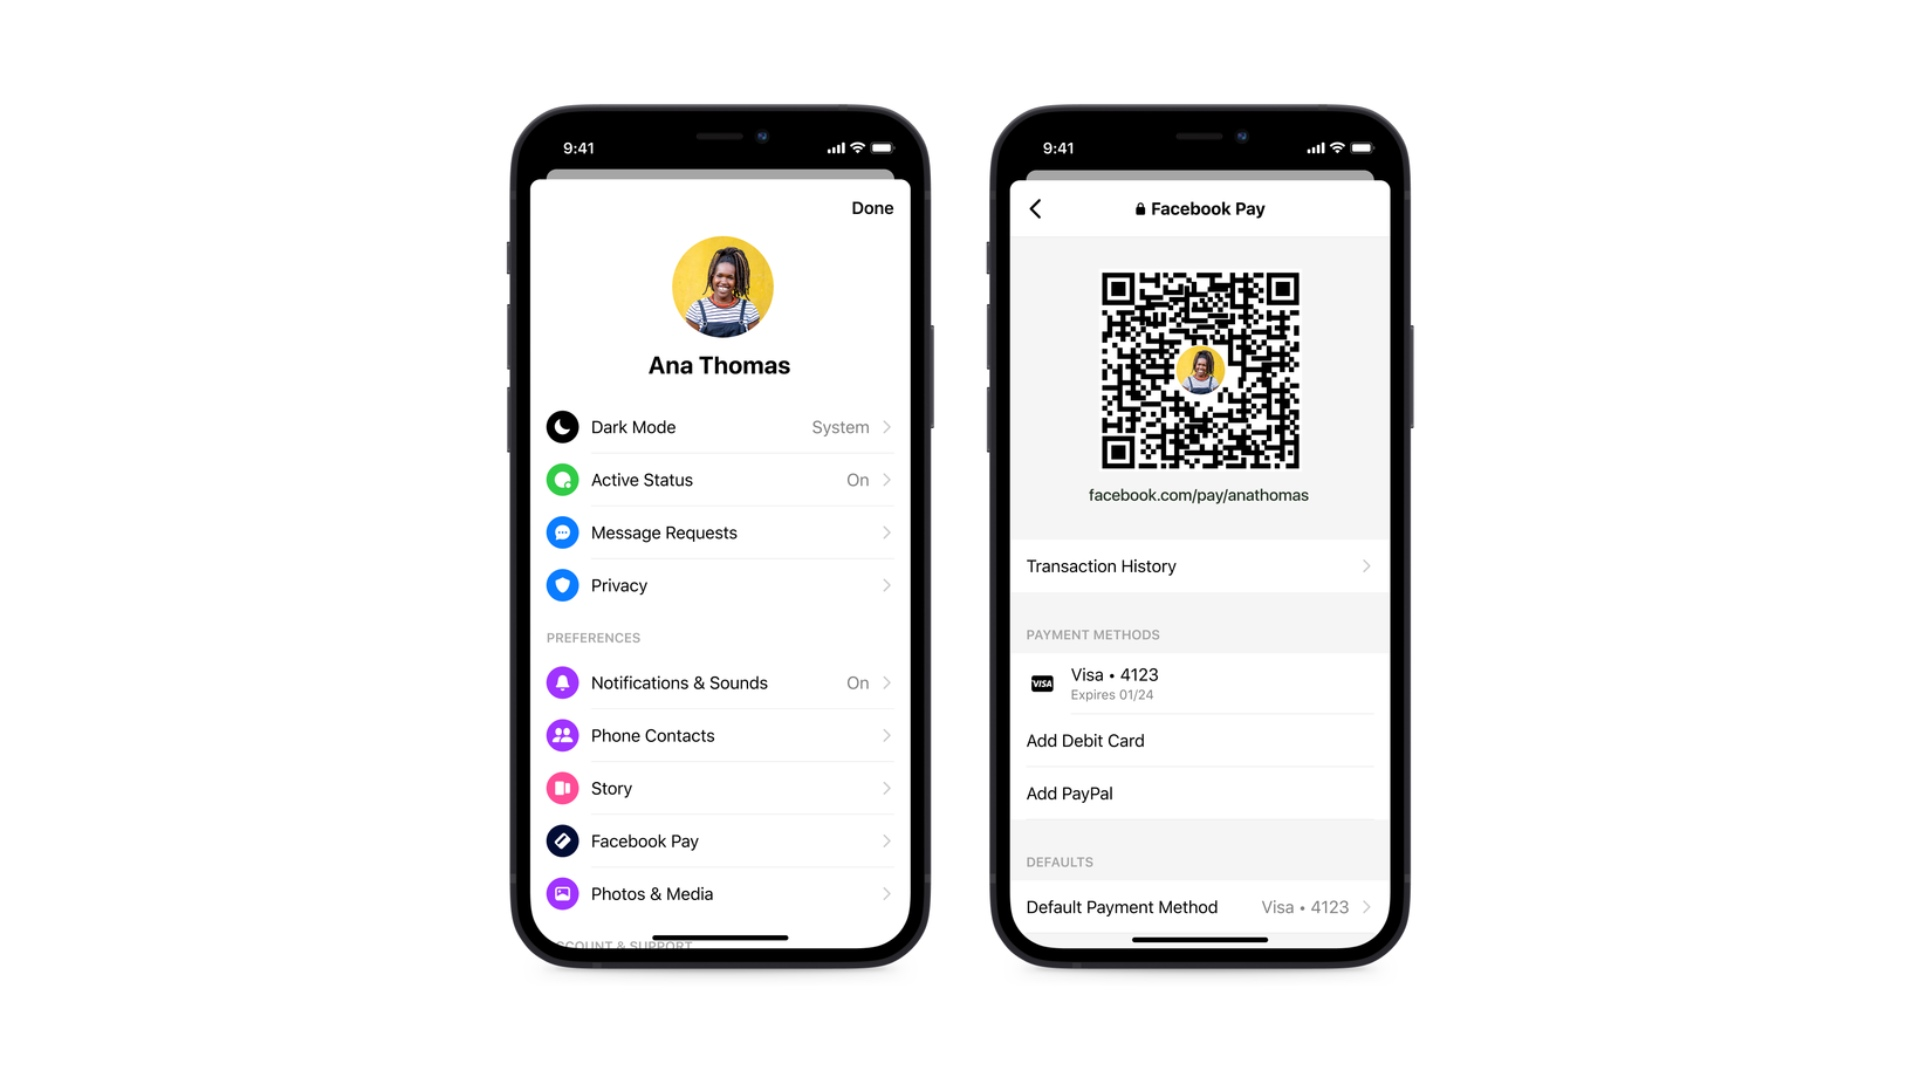 Facebook Messenger Actualizare cu Noutati in Telefoane si Tablete bara